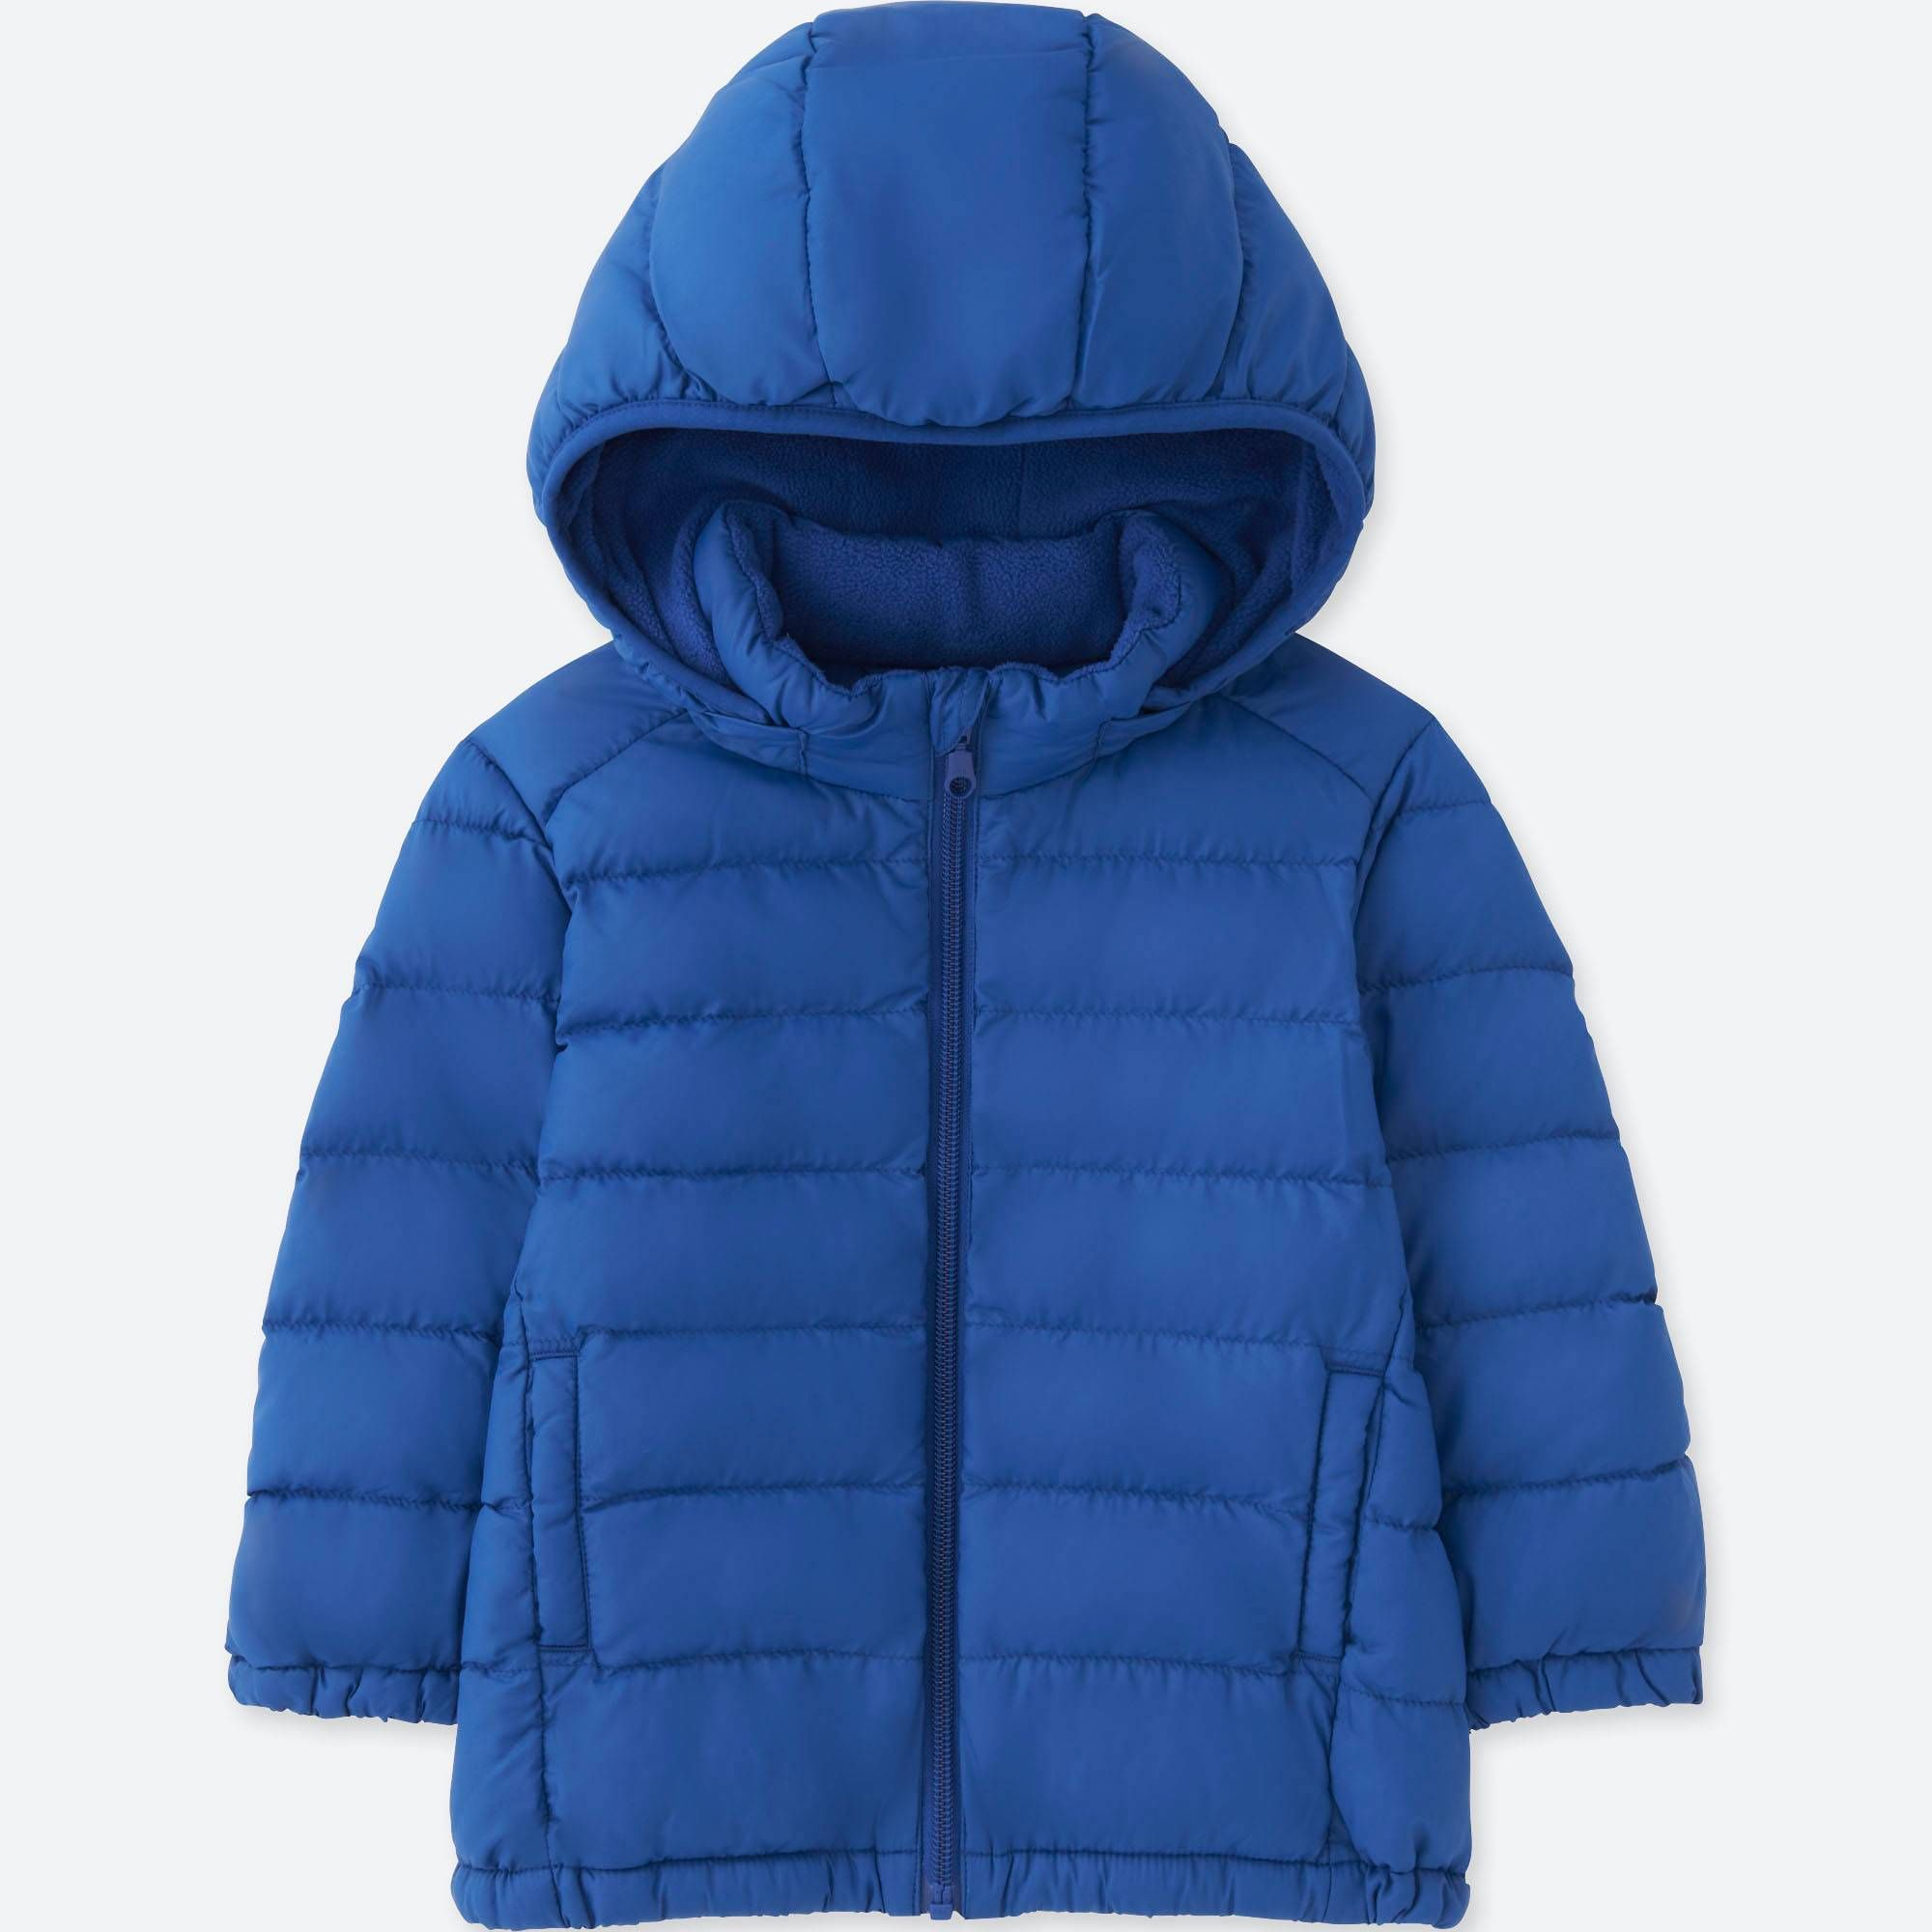 Toddler Light Warm Padded Full Zip Parka Toddler Outerwear Toddler Coat Parka [ 2000 x 2000 Pixel ]